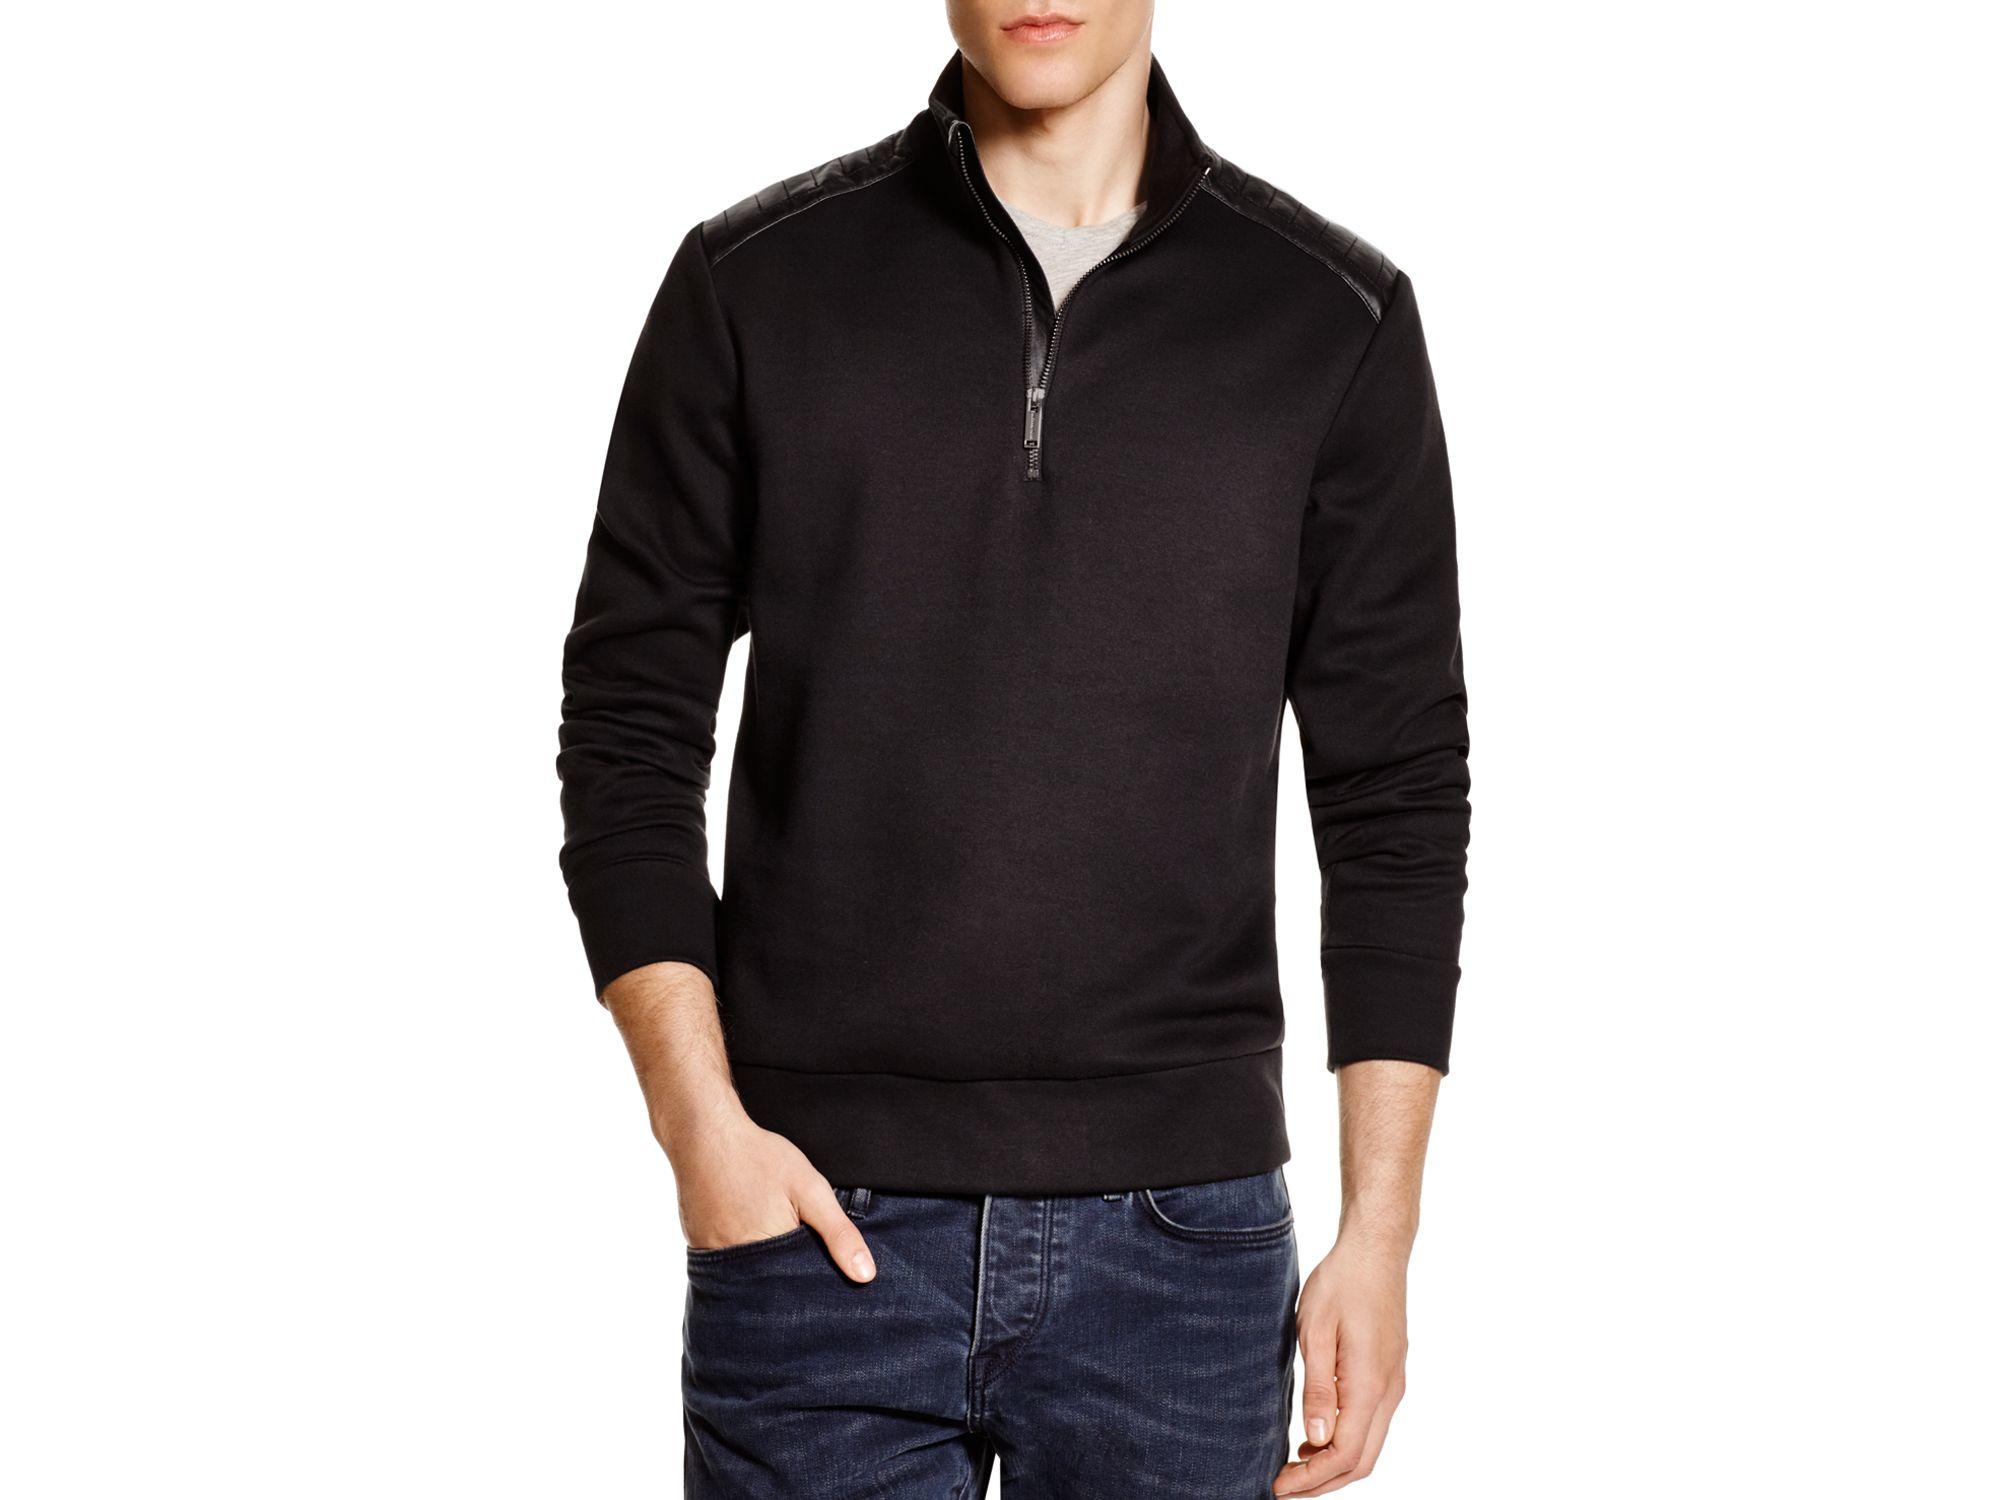 Michael kors Cotton Leather Trim Half Zip Sweater in Black for Men ...